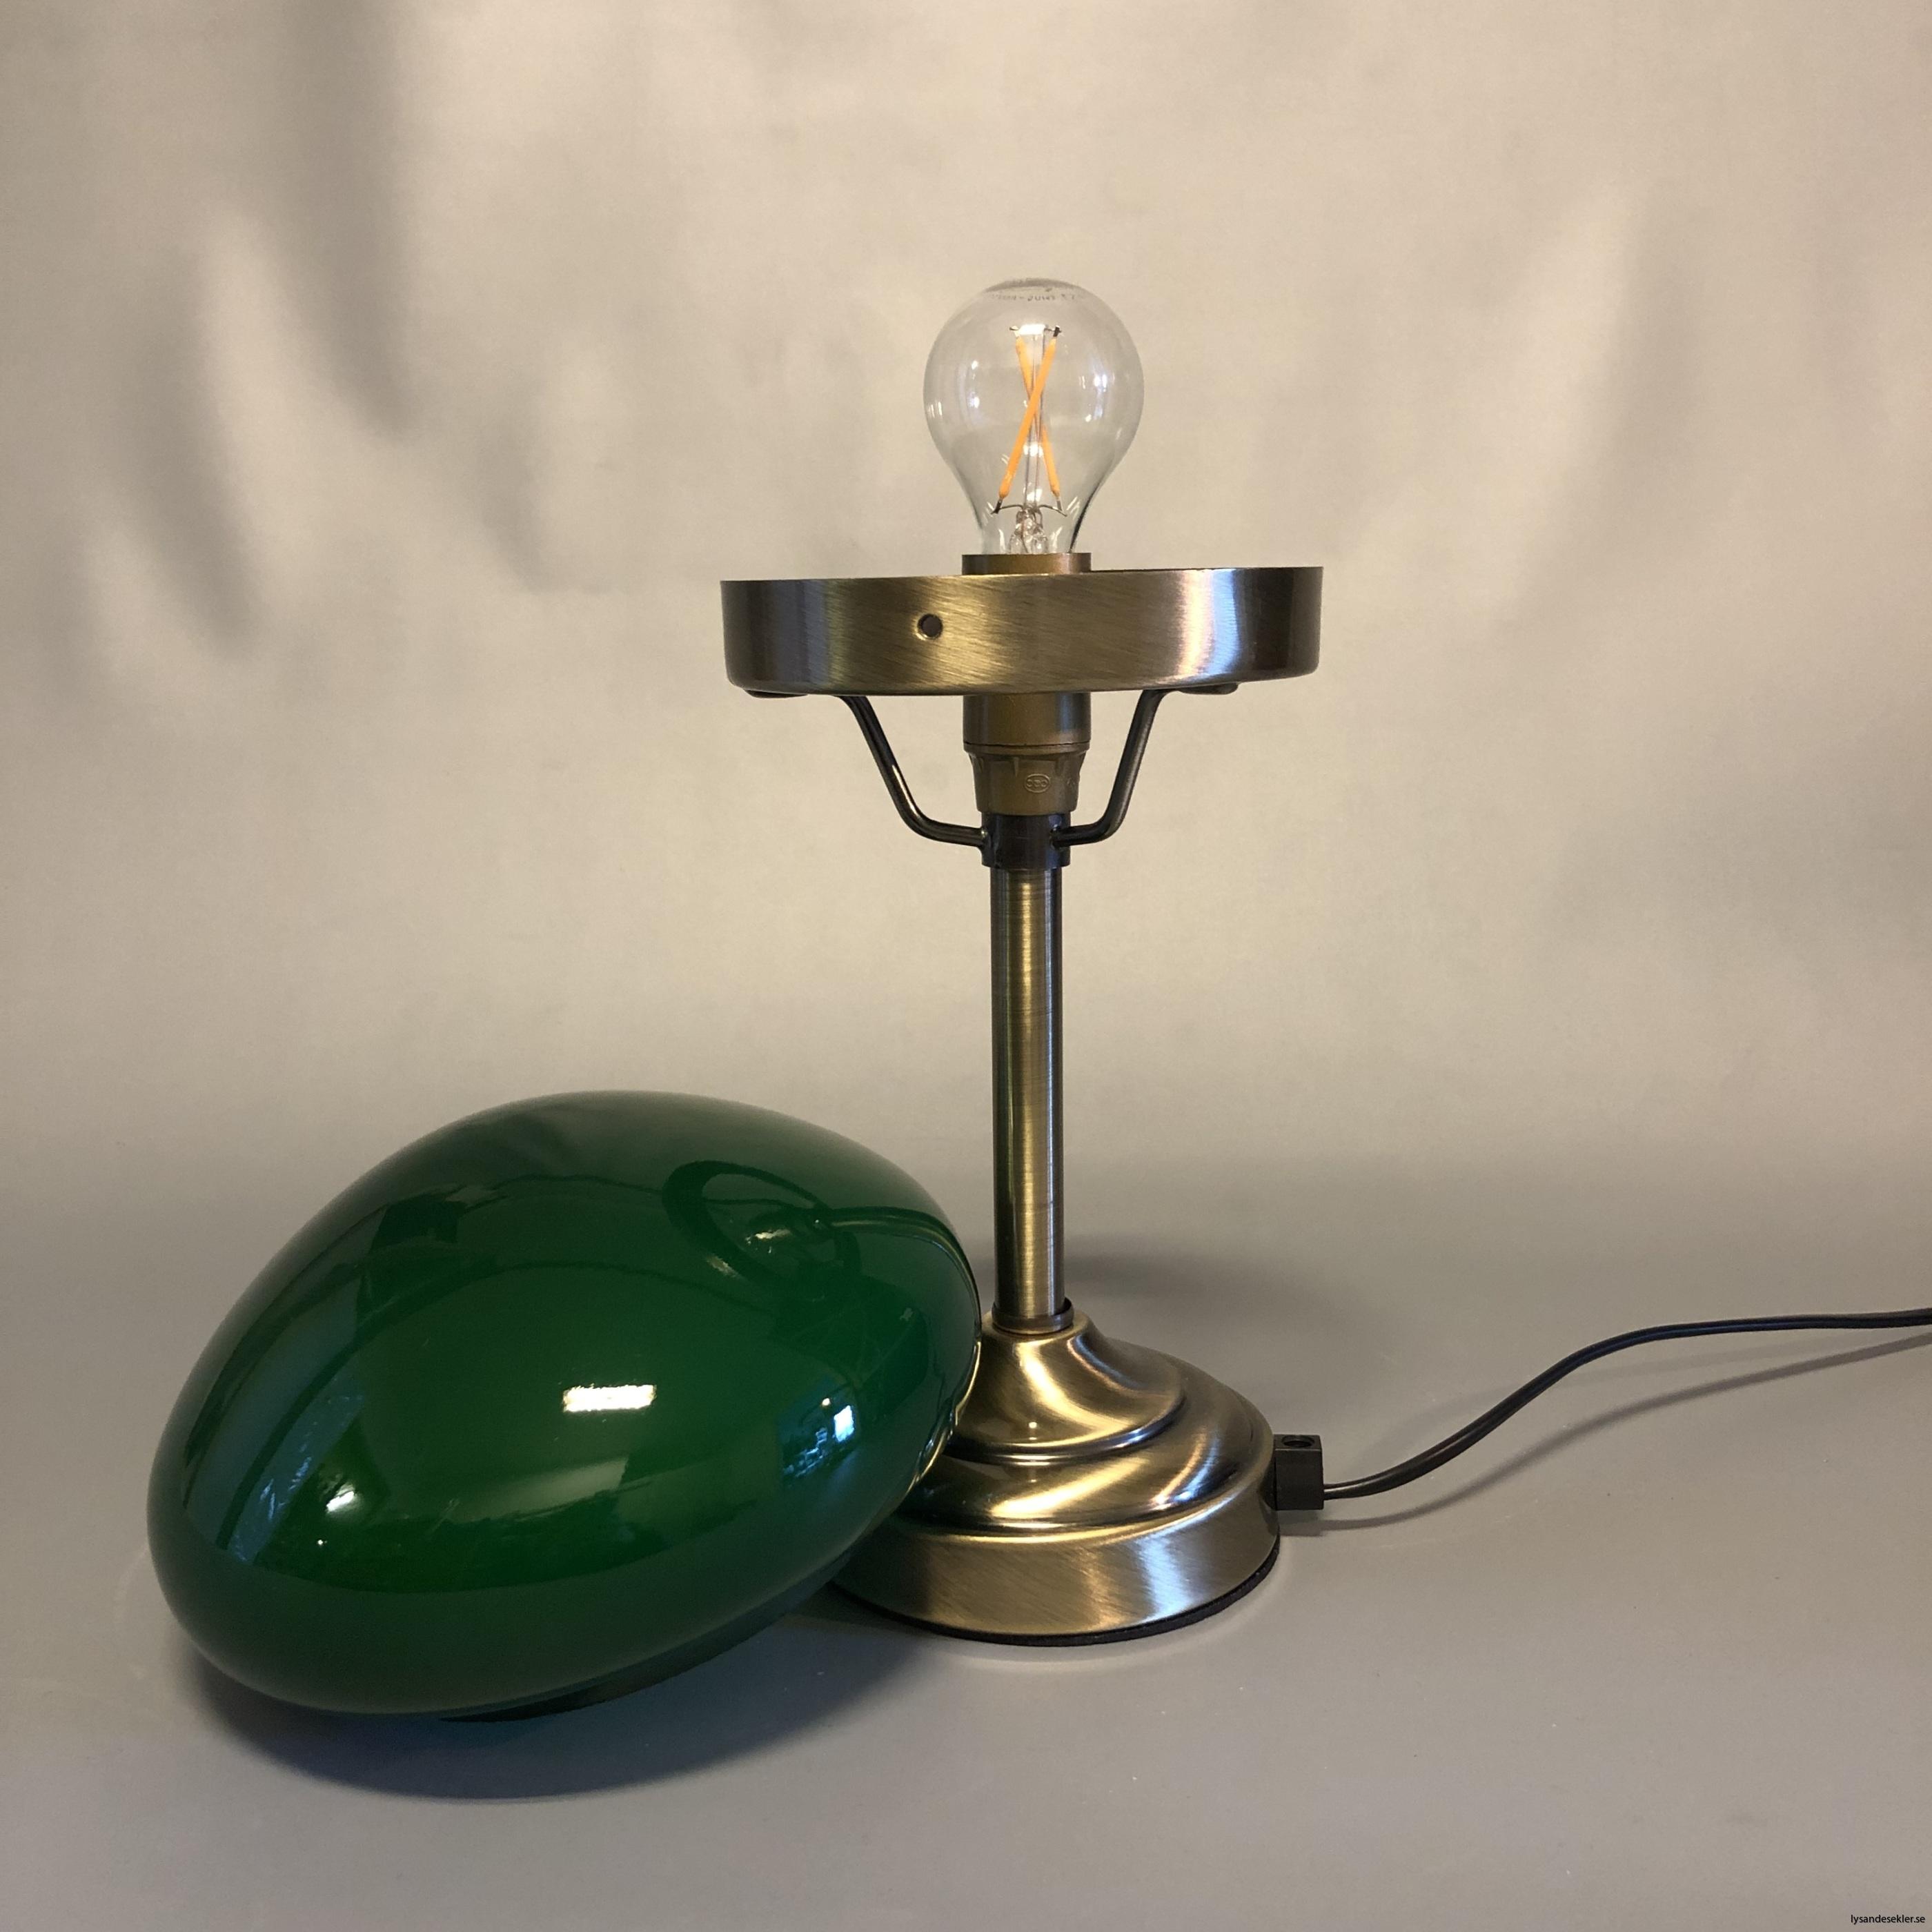 liten strindbergslampa 12 cm skärm24